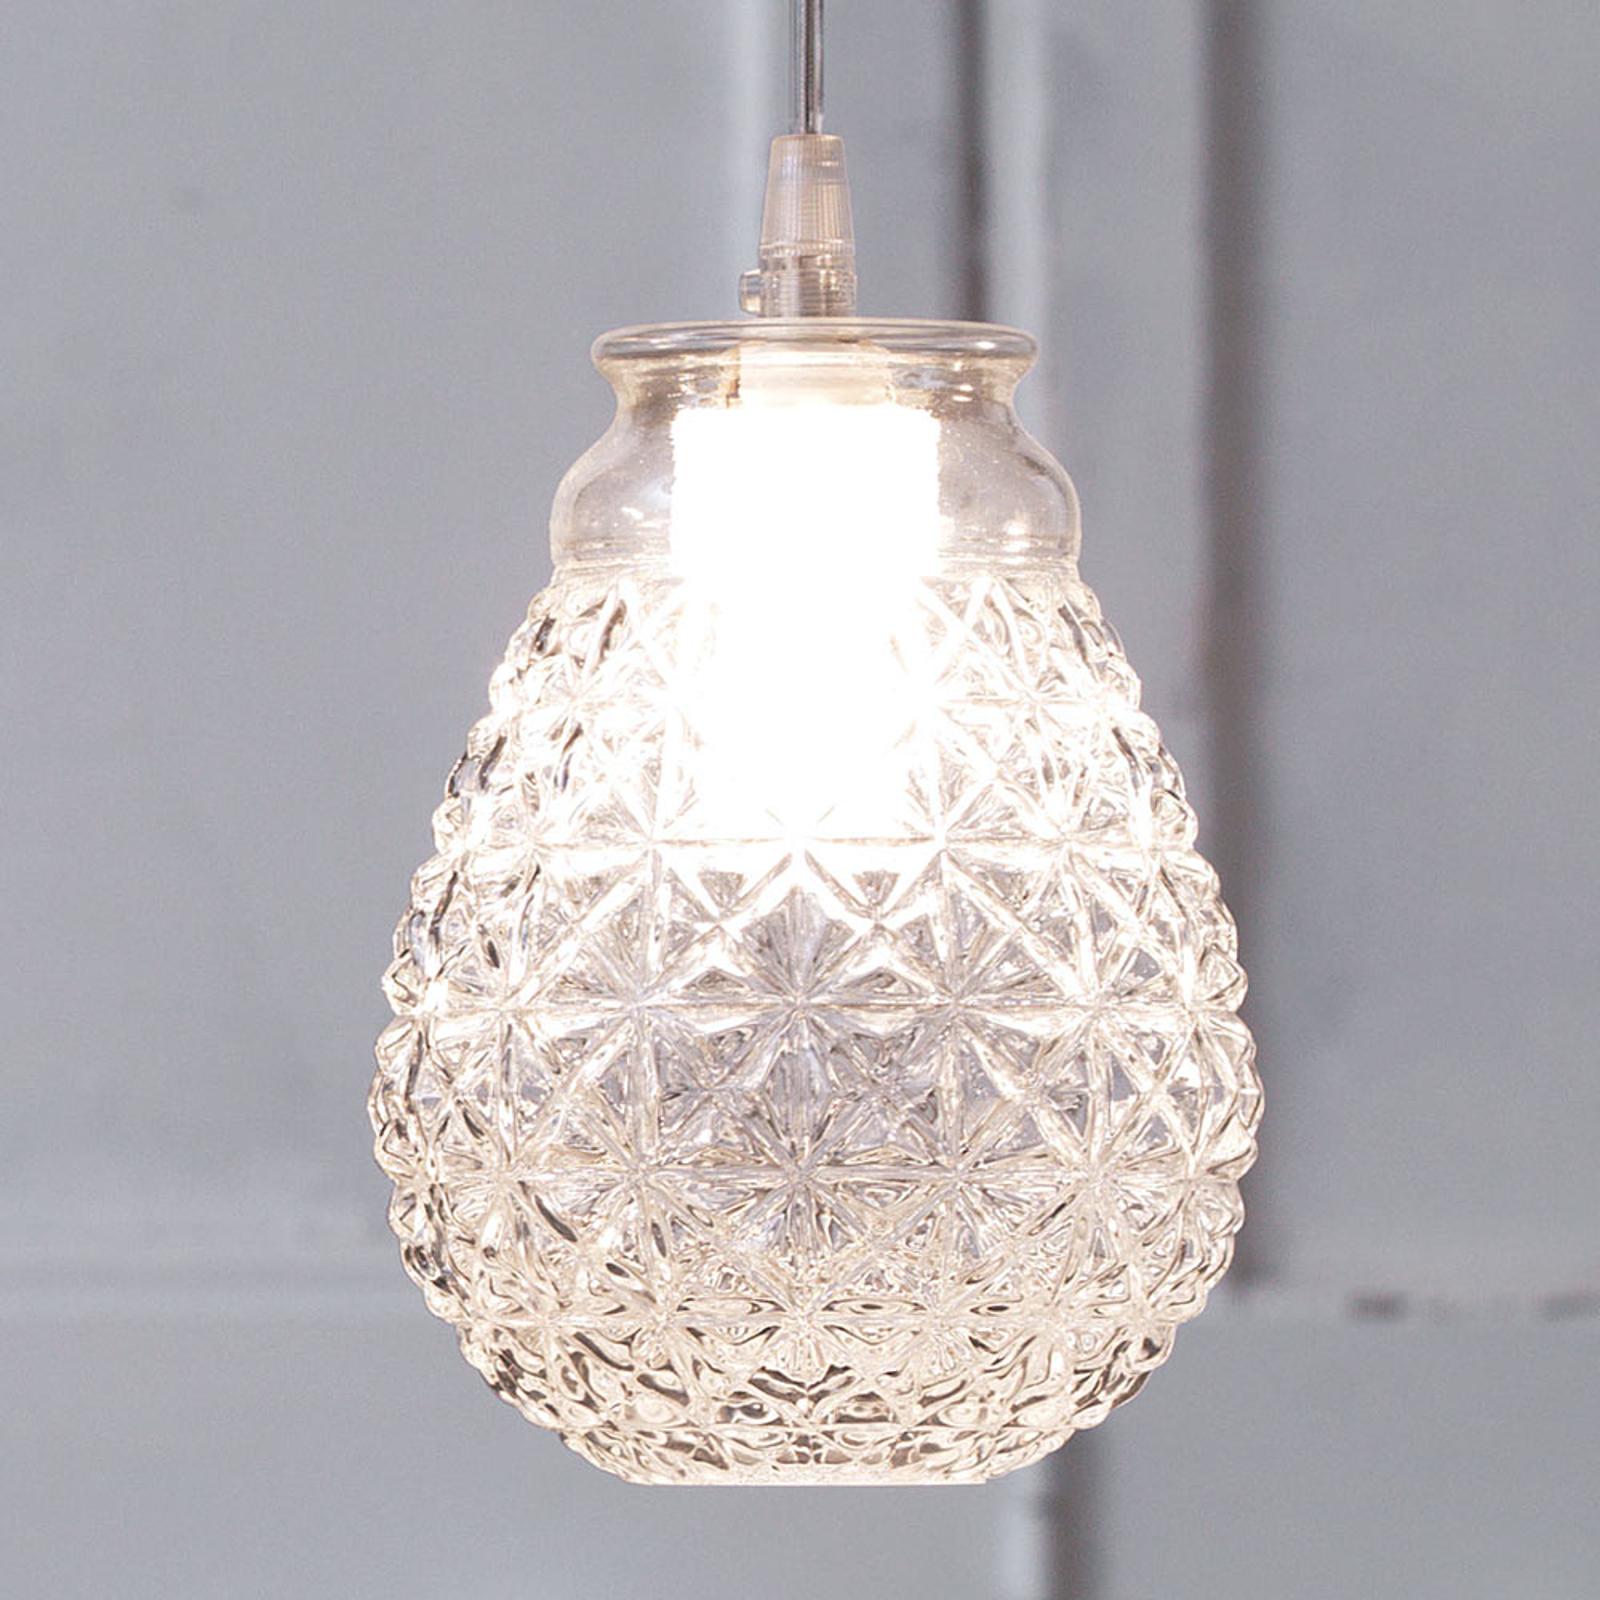 Karman Ceraunavolta, glazen hanglamp, mondgeblazen